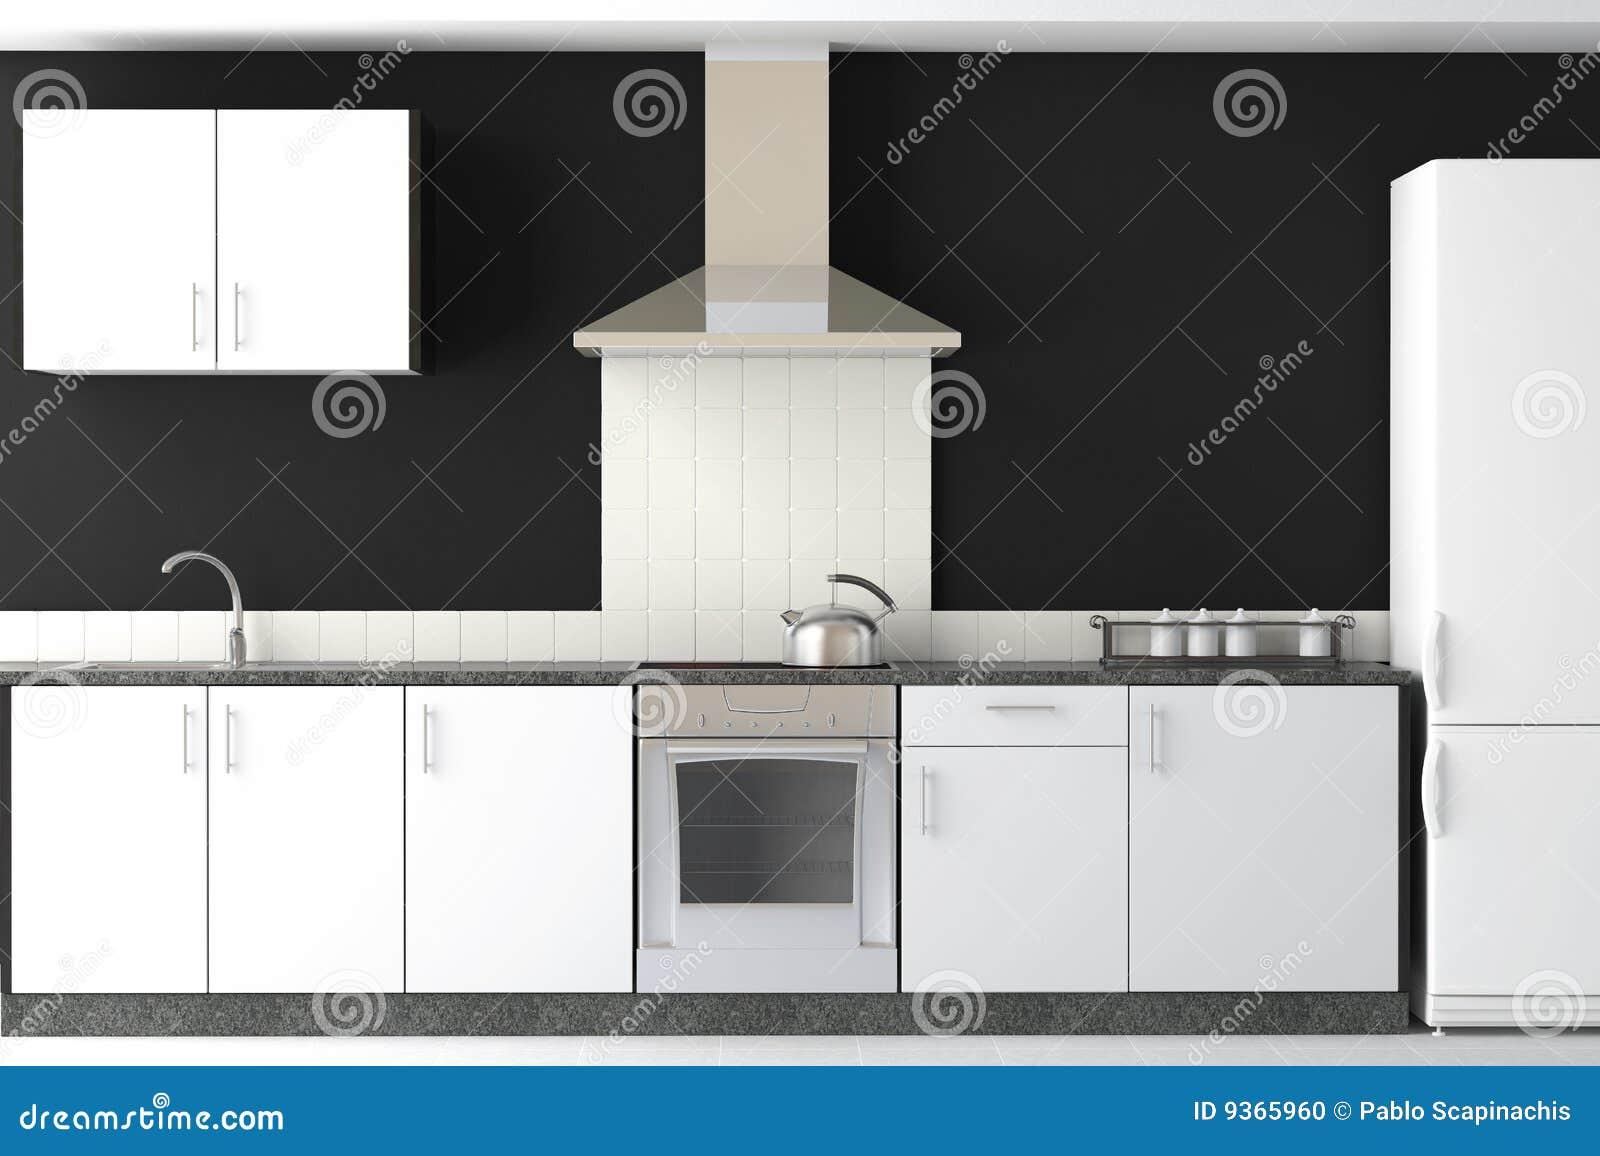 Zwart Wit Fotos Keuken ~ anortiz.com for .